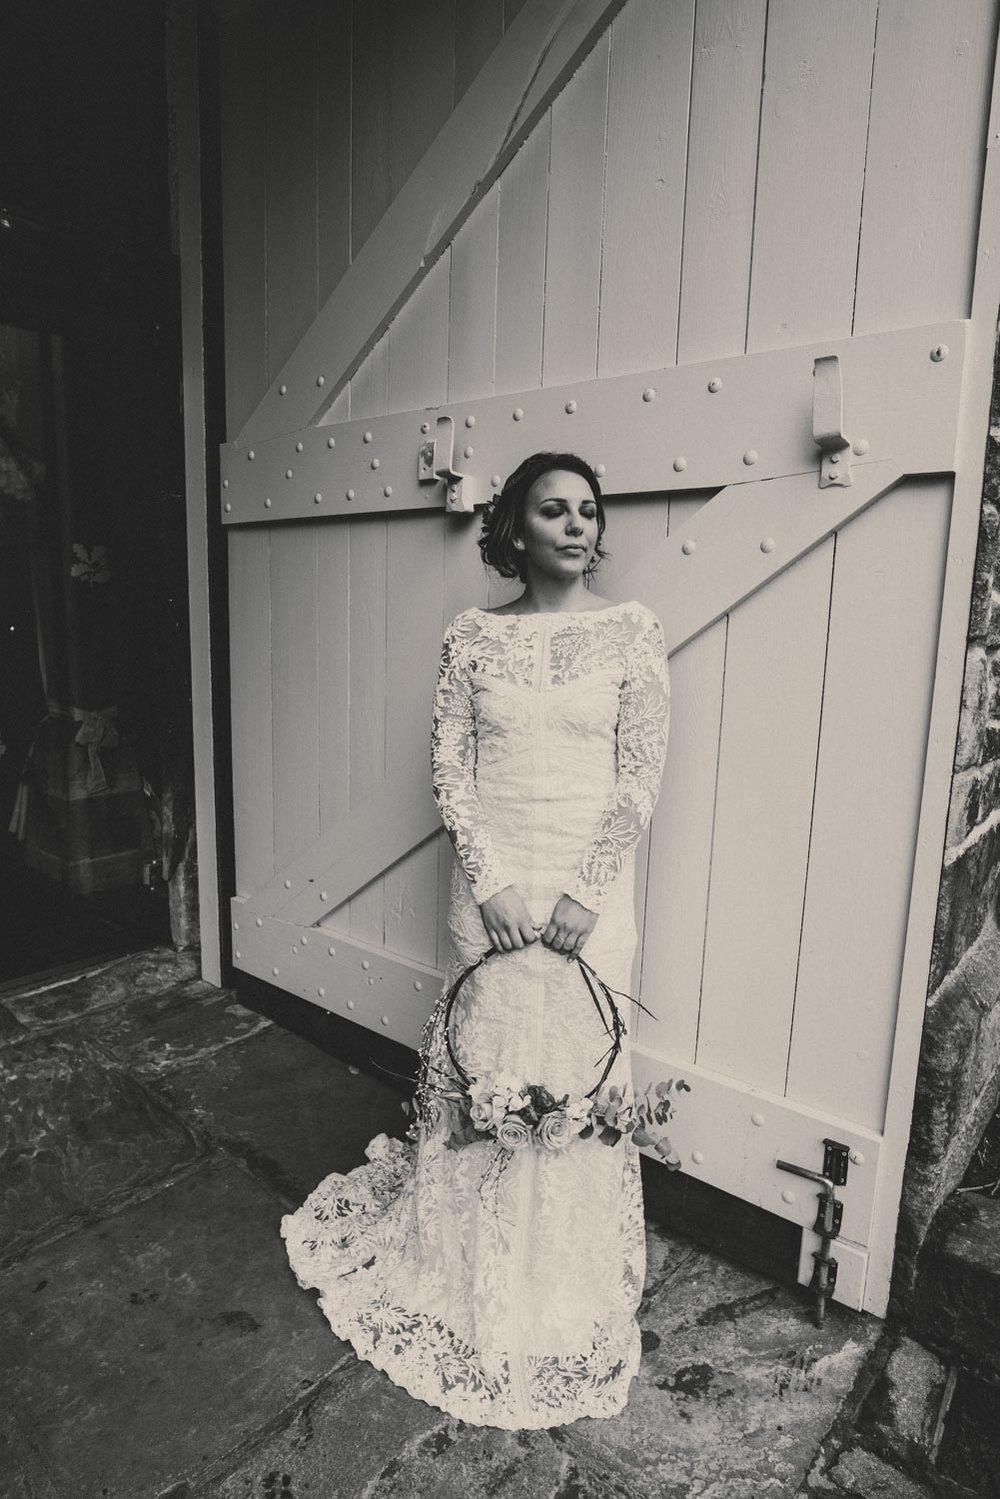 east-riddlesden-hall-wedding-jade-maguire-photography (31).jpg